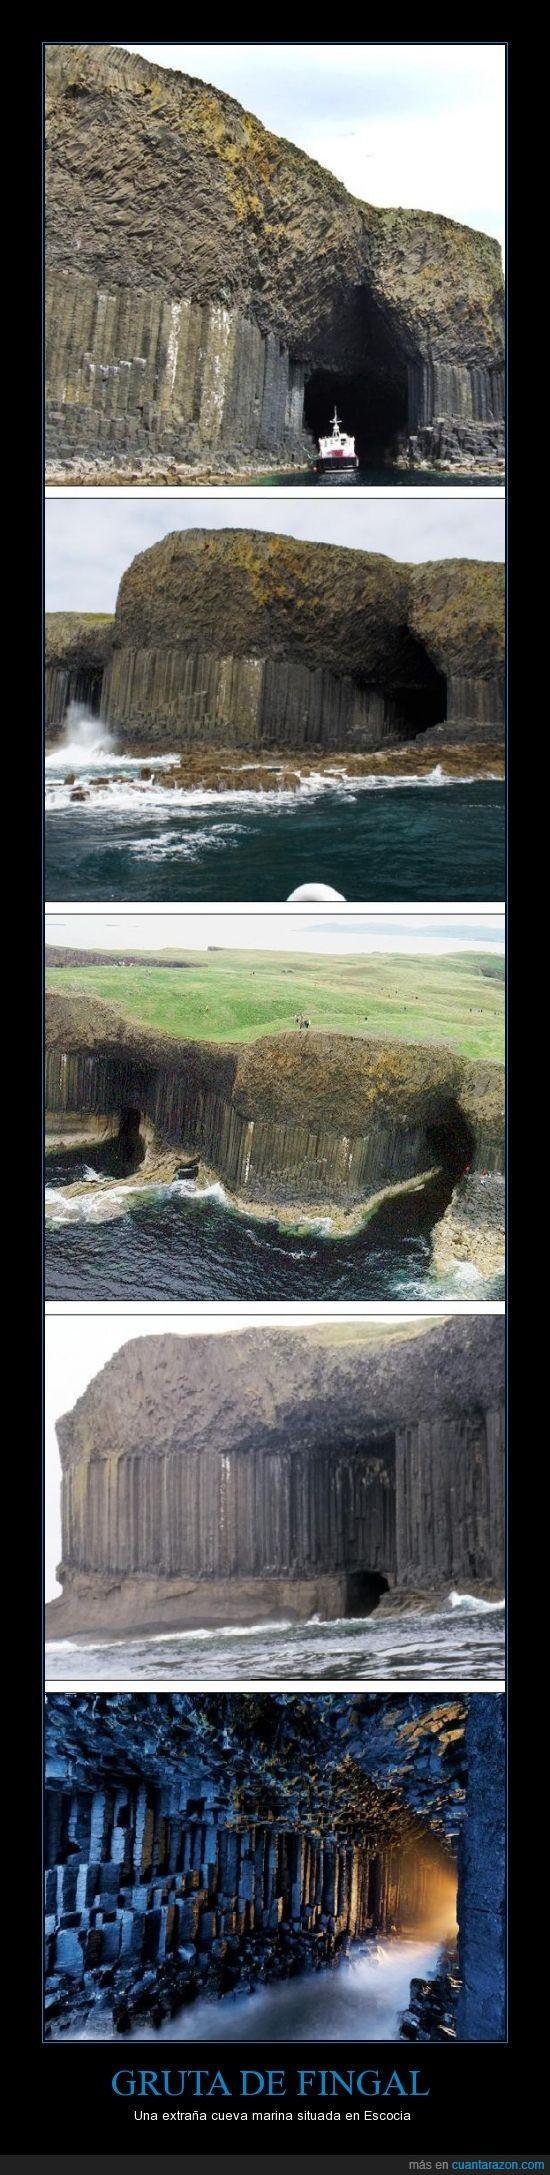 geografia_gruta_de_fingal